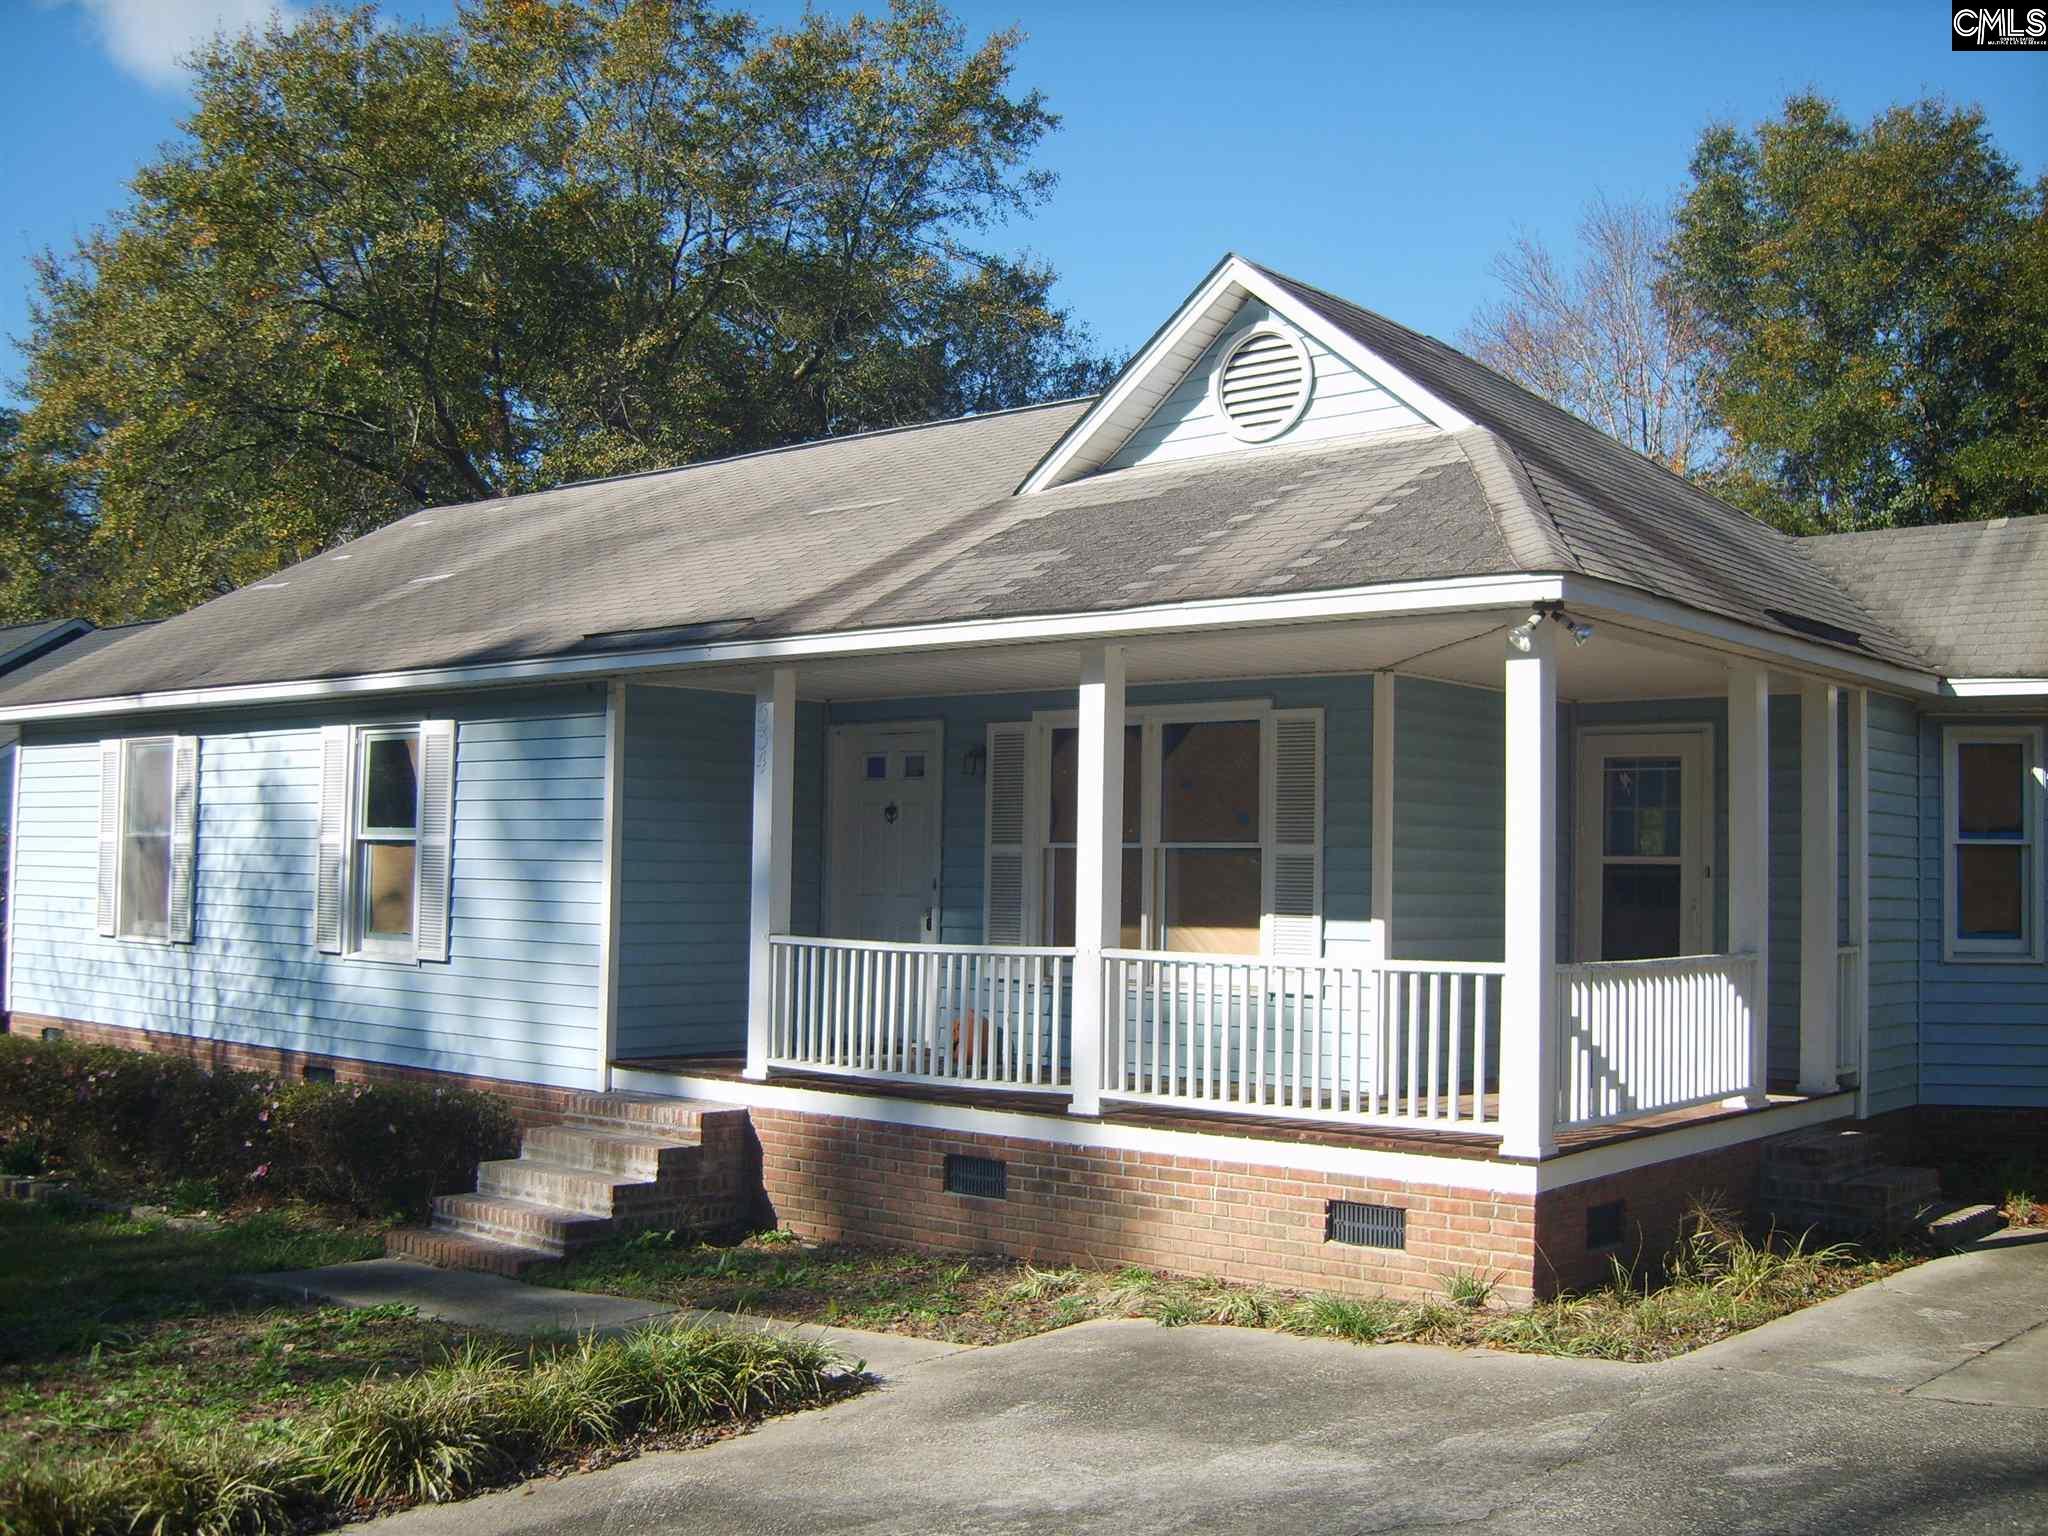 534 Old Barnwell West Columbia, SC 29169-2449